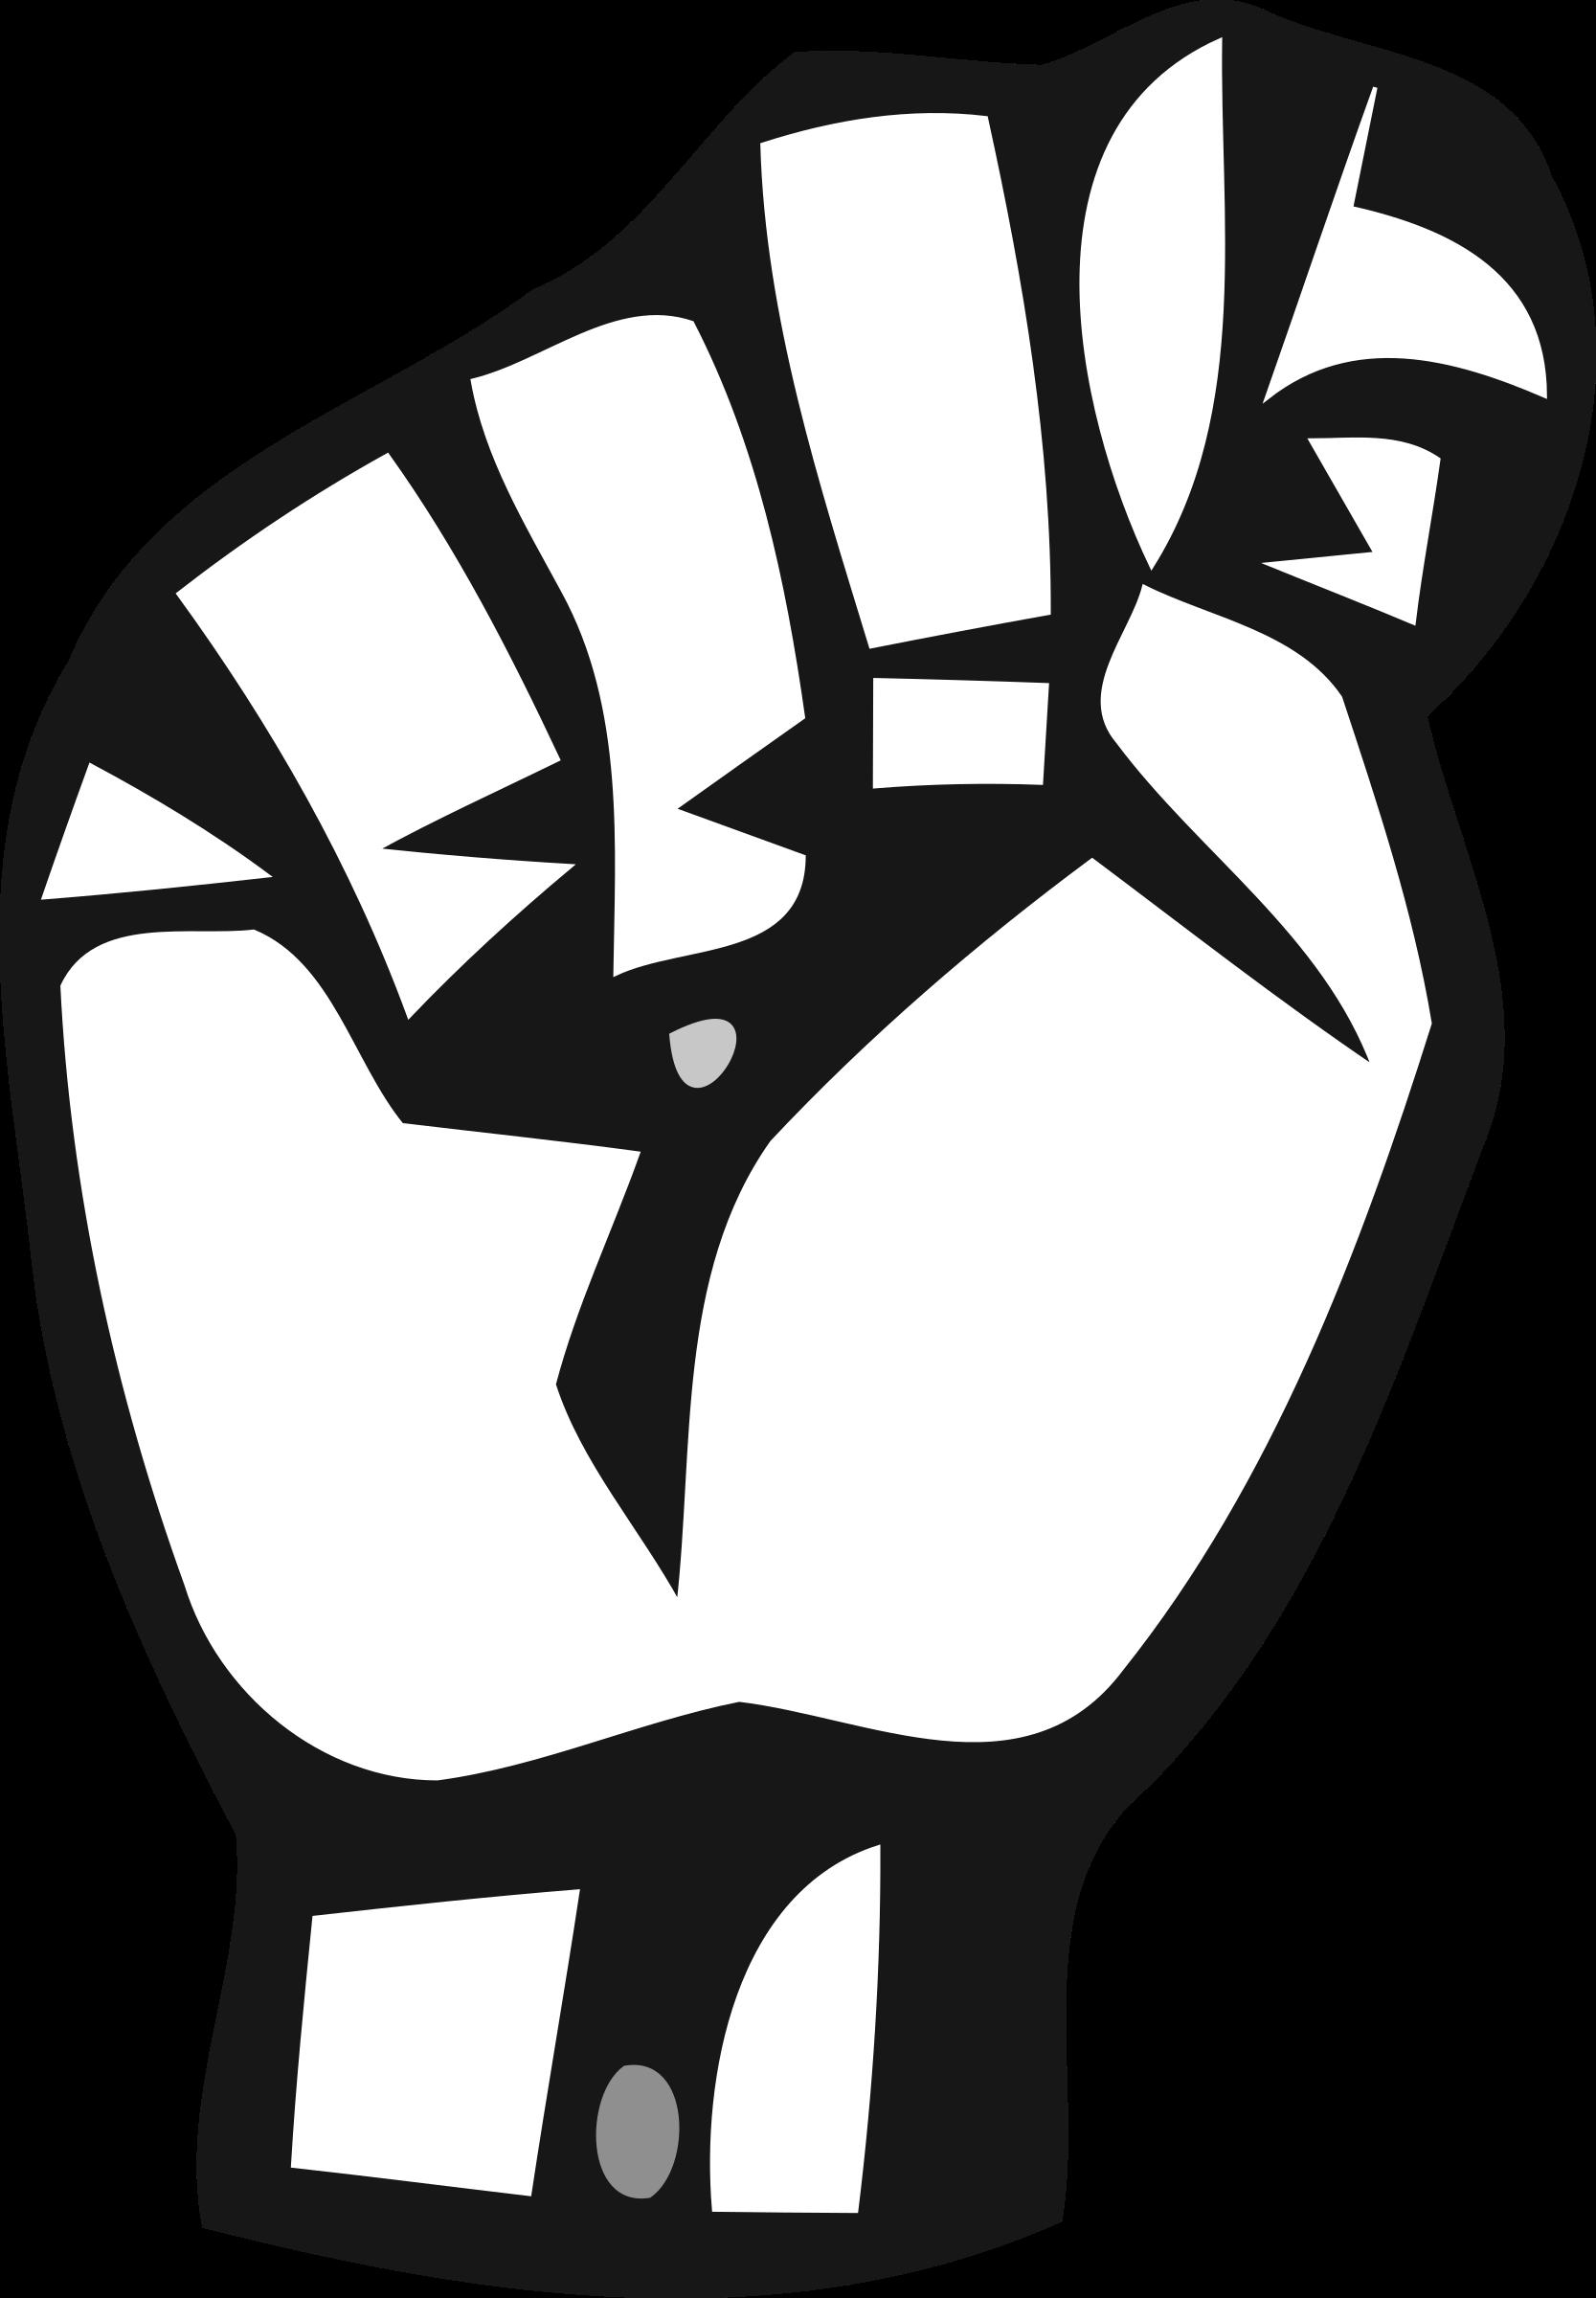 Sign language alphabet clipart picture freeuse library Clipart - Deaf Alphabet T picture freeuse library